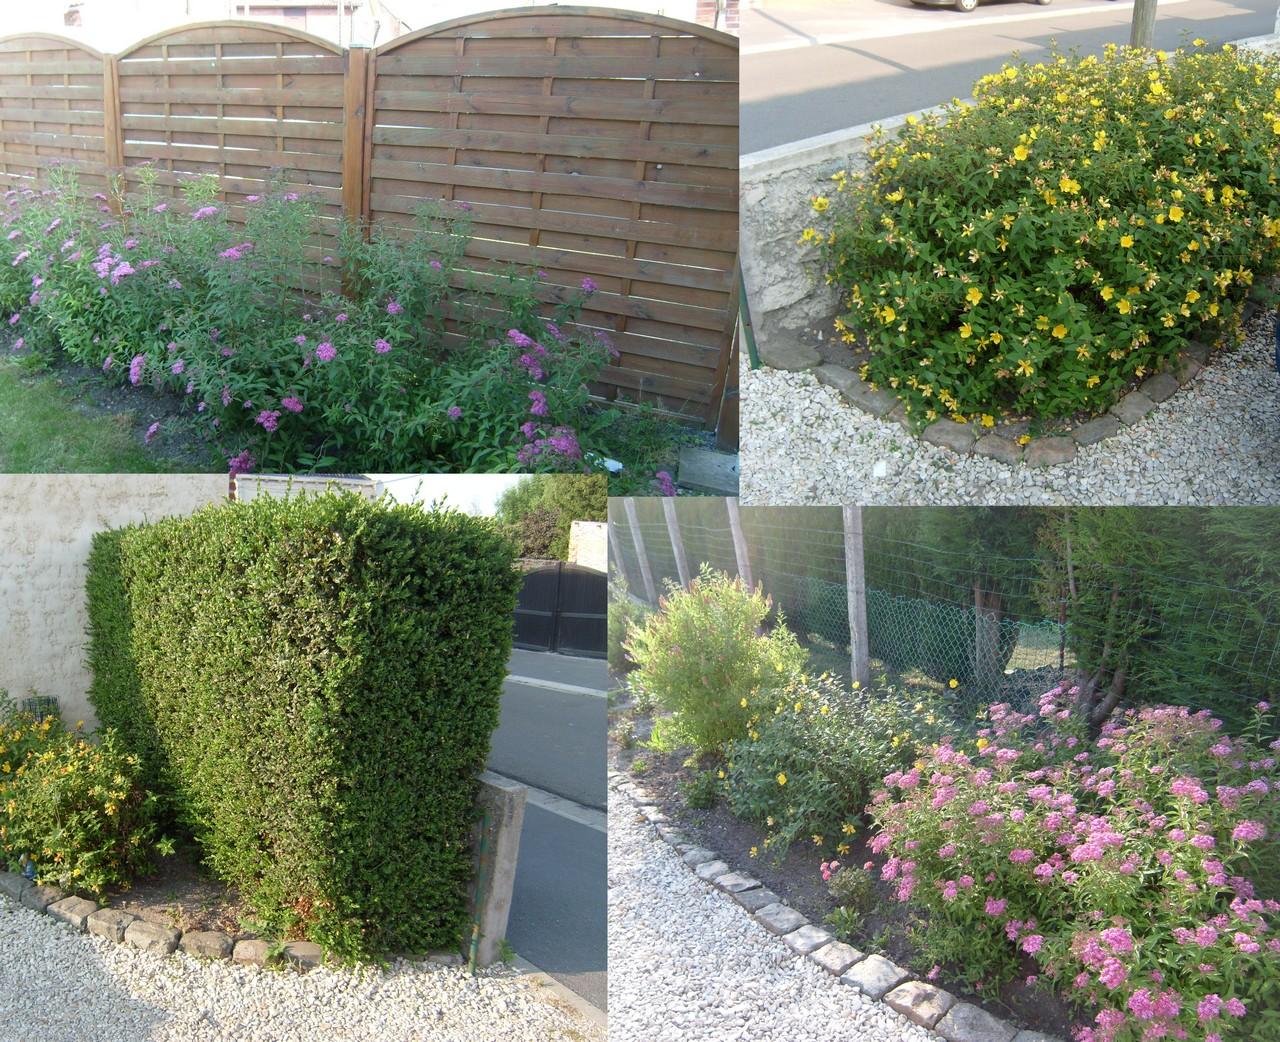 Petit tour dans le jardin blog magicmanu - Manu chao le petit jardin youtube ...